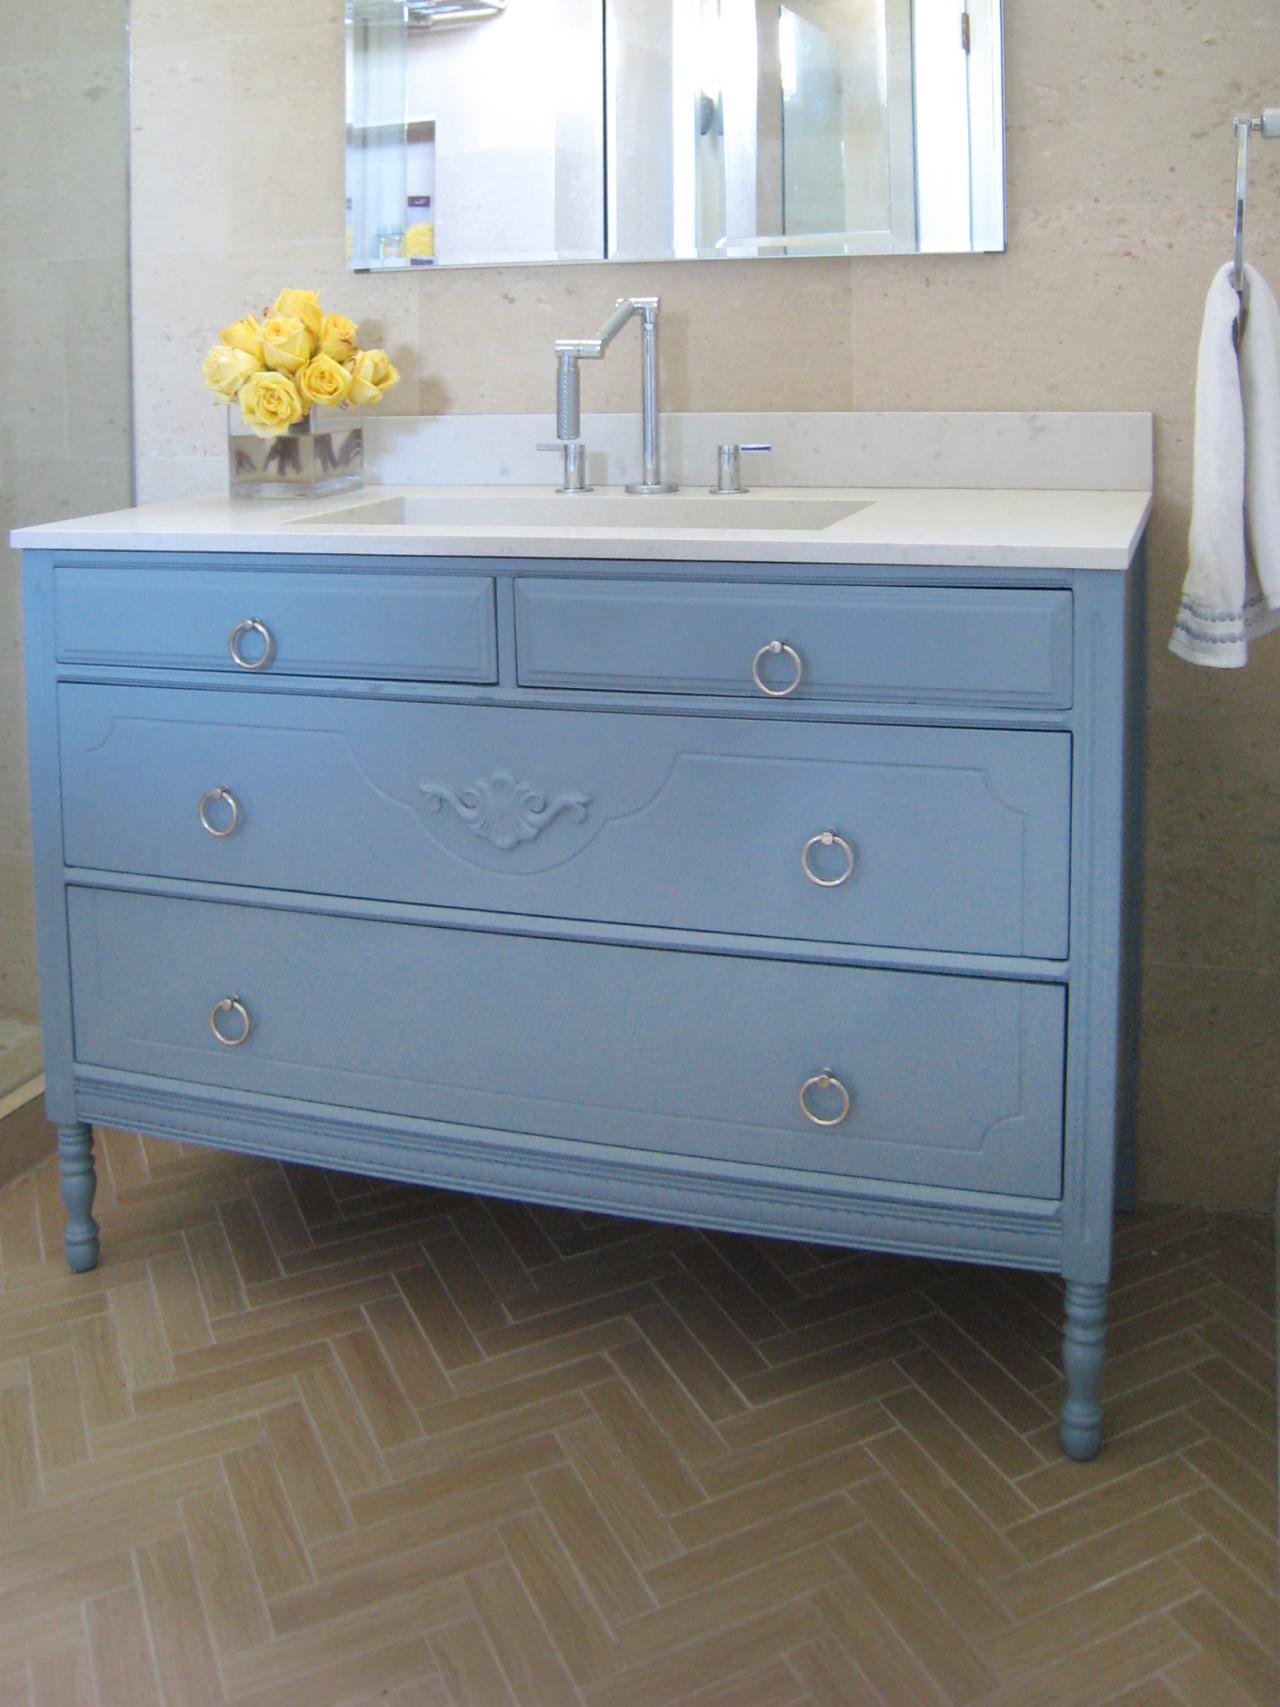 Original Erinn Valencich Bathroom Cabinet